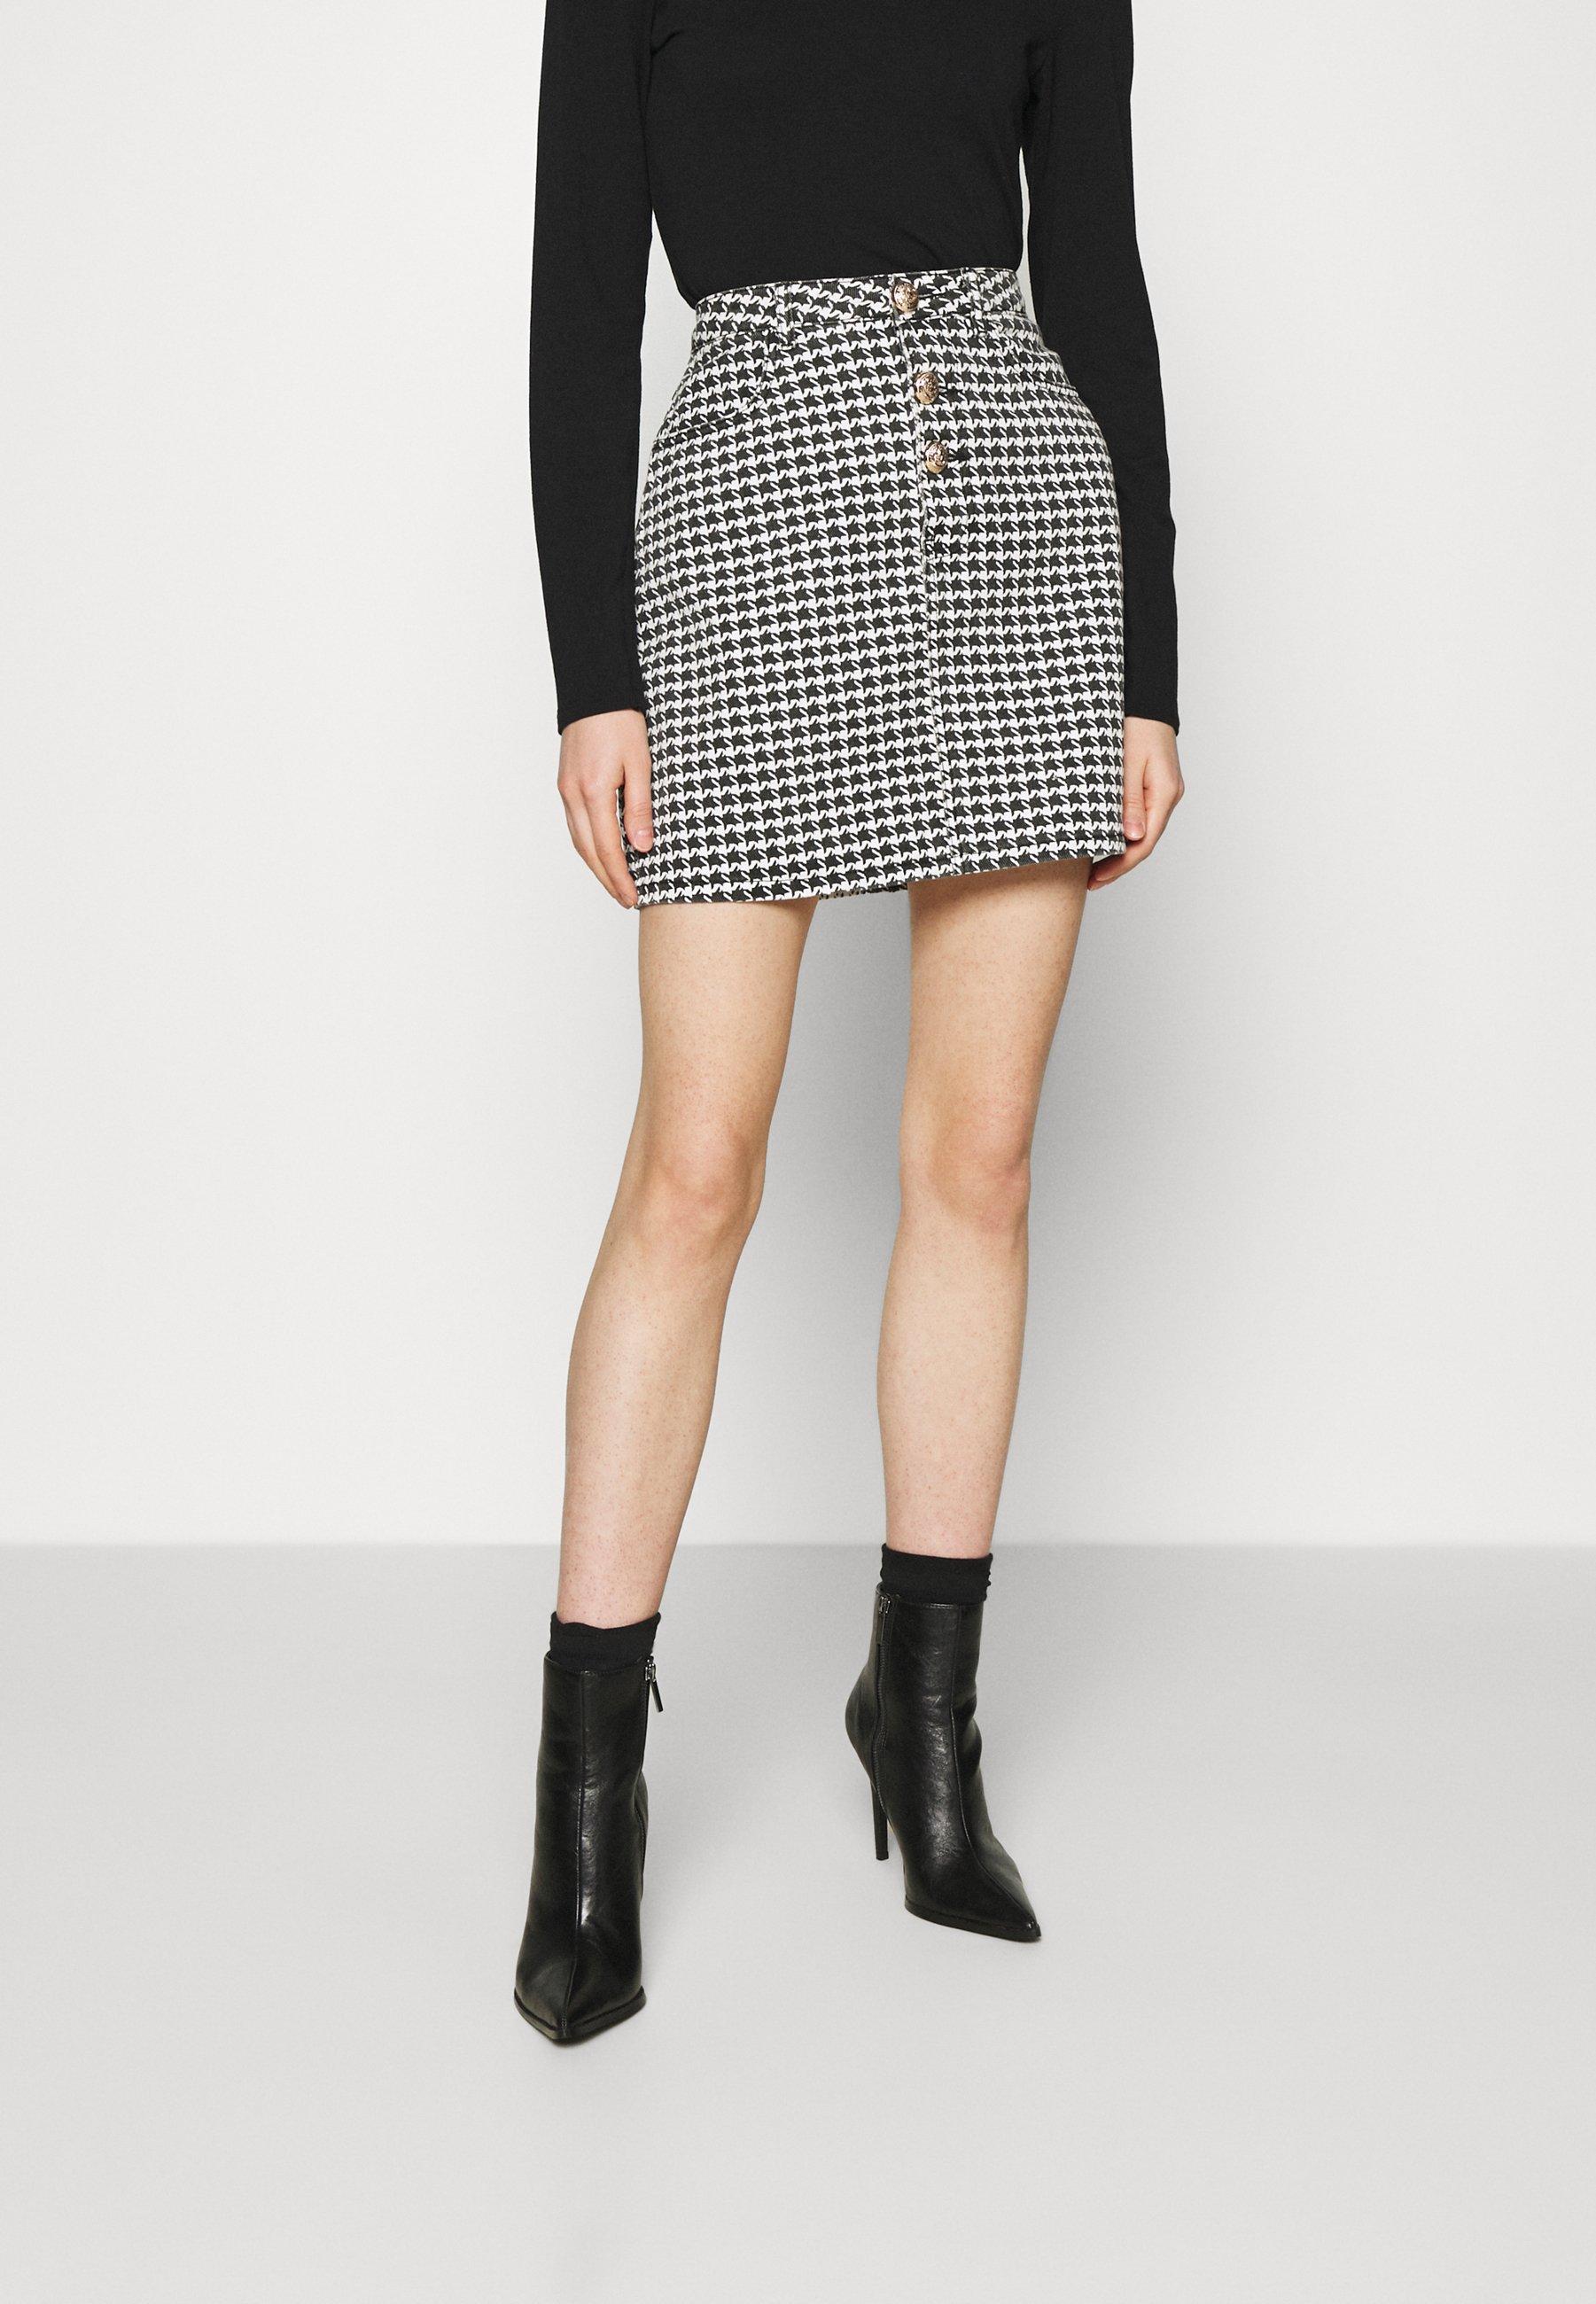 Femme HOUNDSTOOTH SKIRT - Minijupe